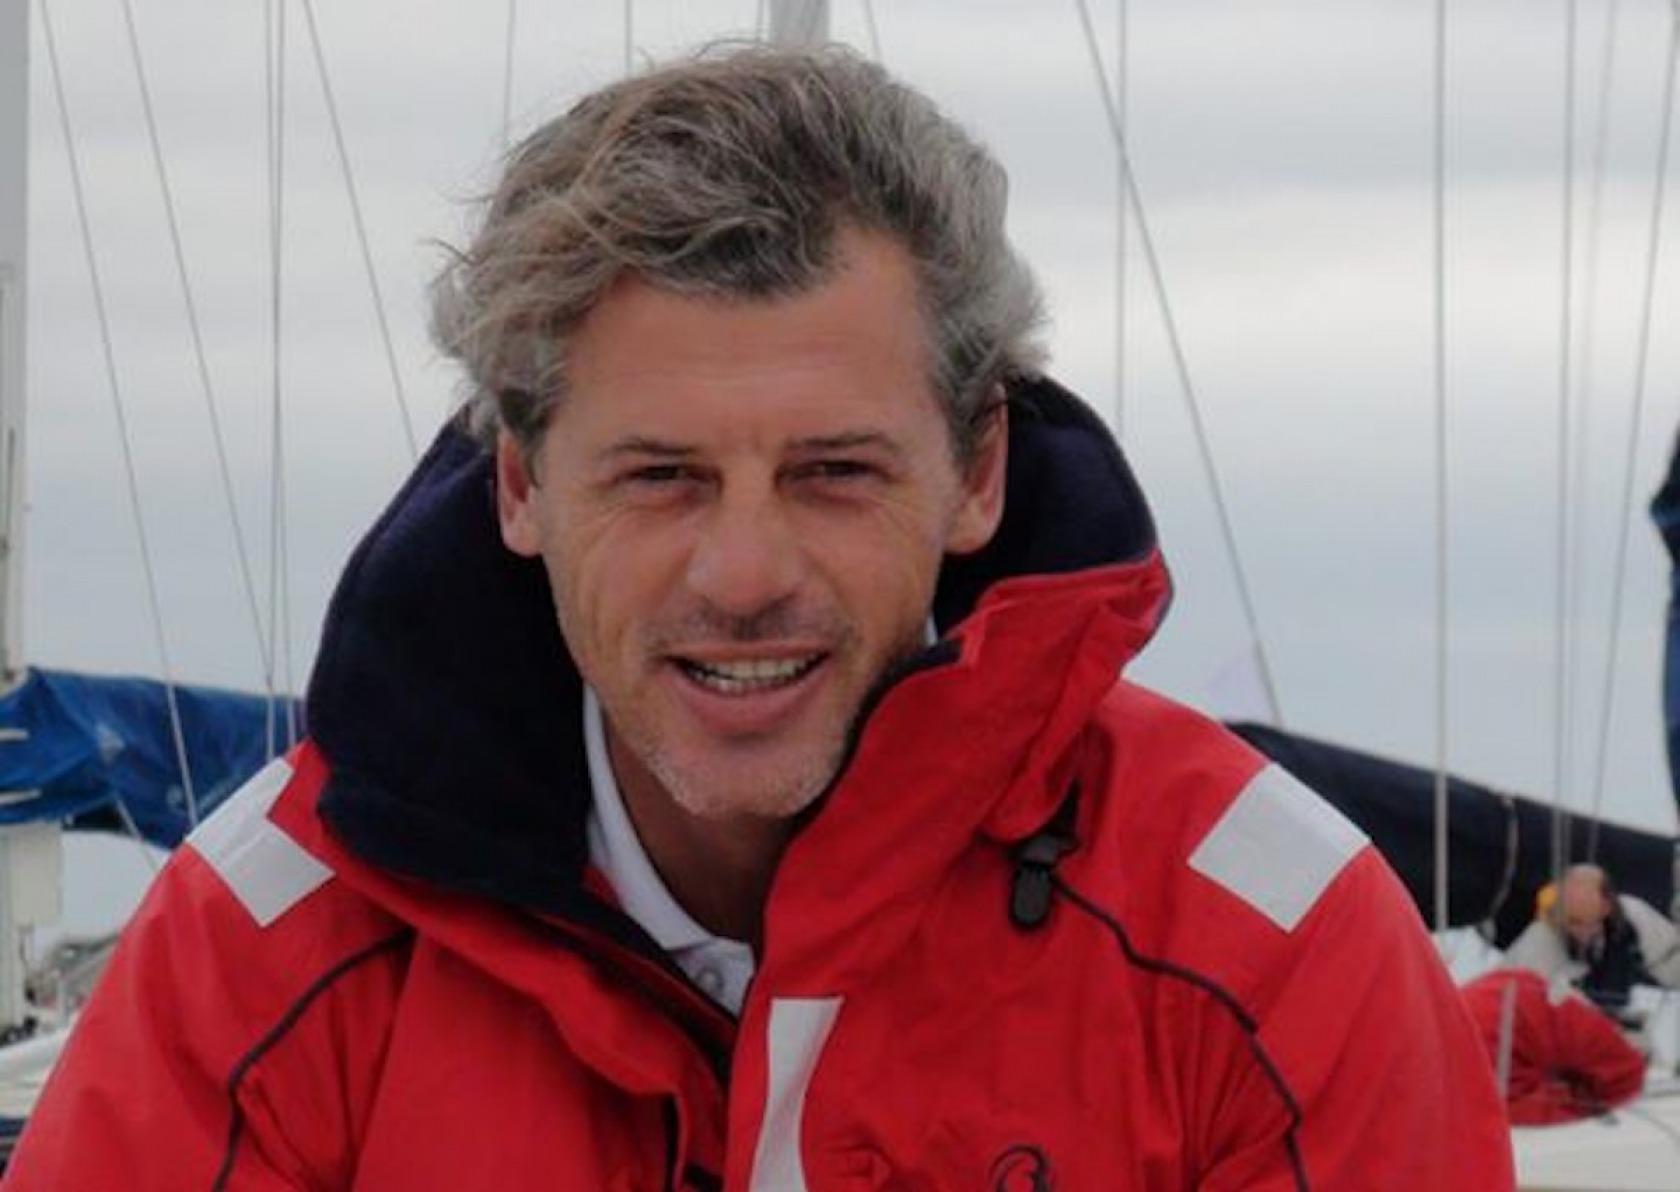 sebastien-destremau-skipper-du-projet-face-ocean-r-1680-1200